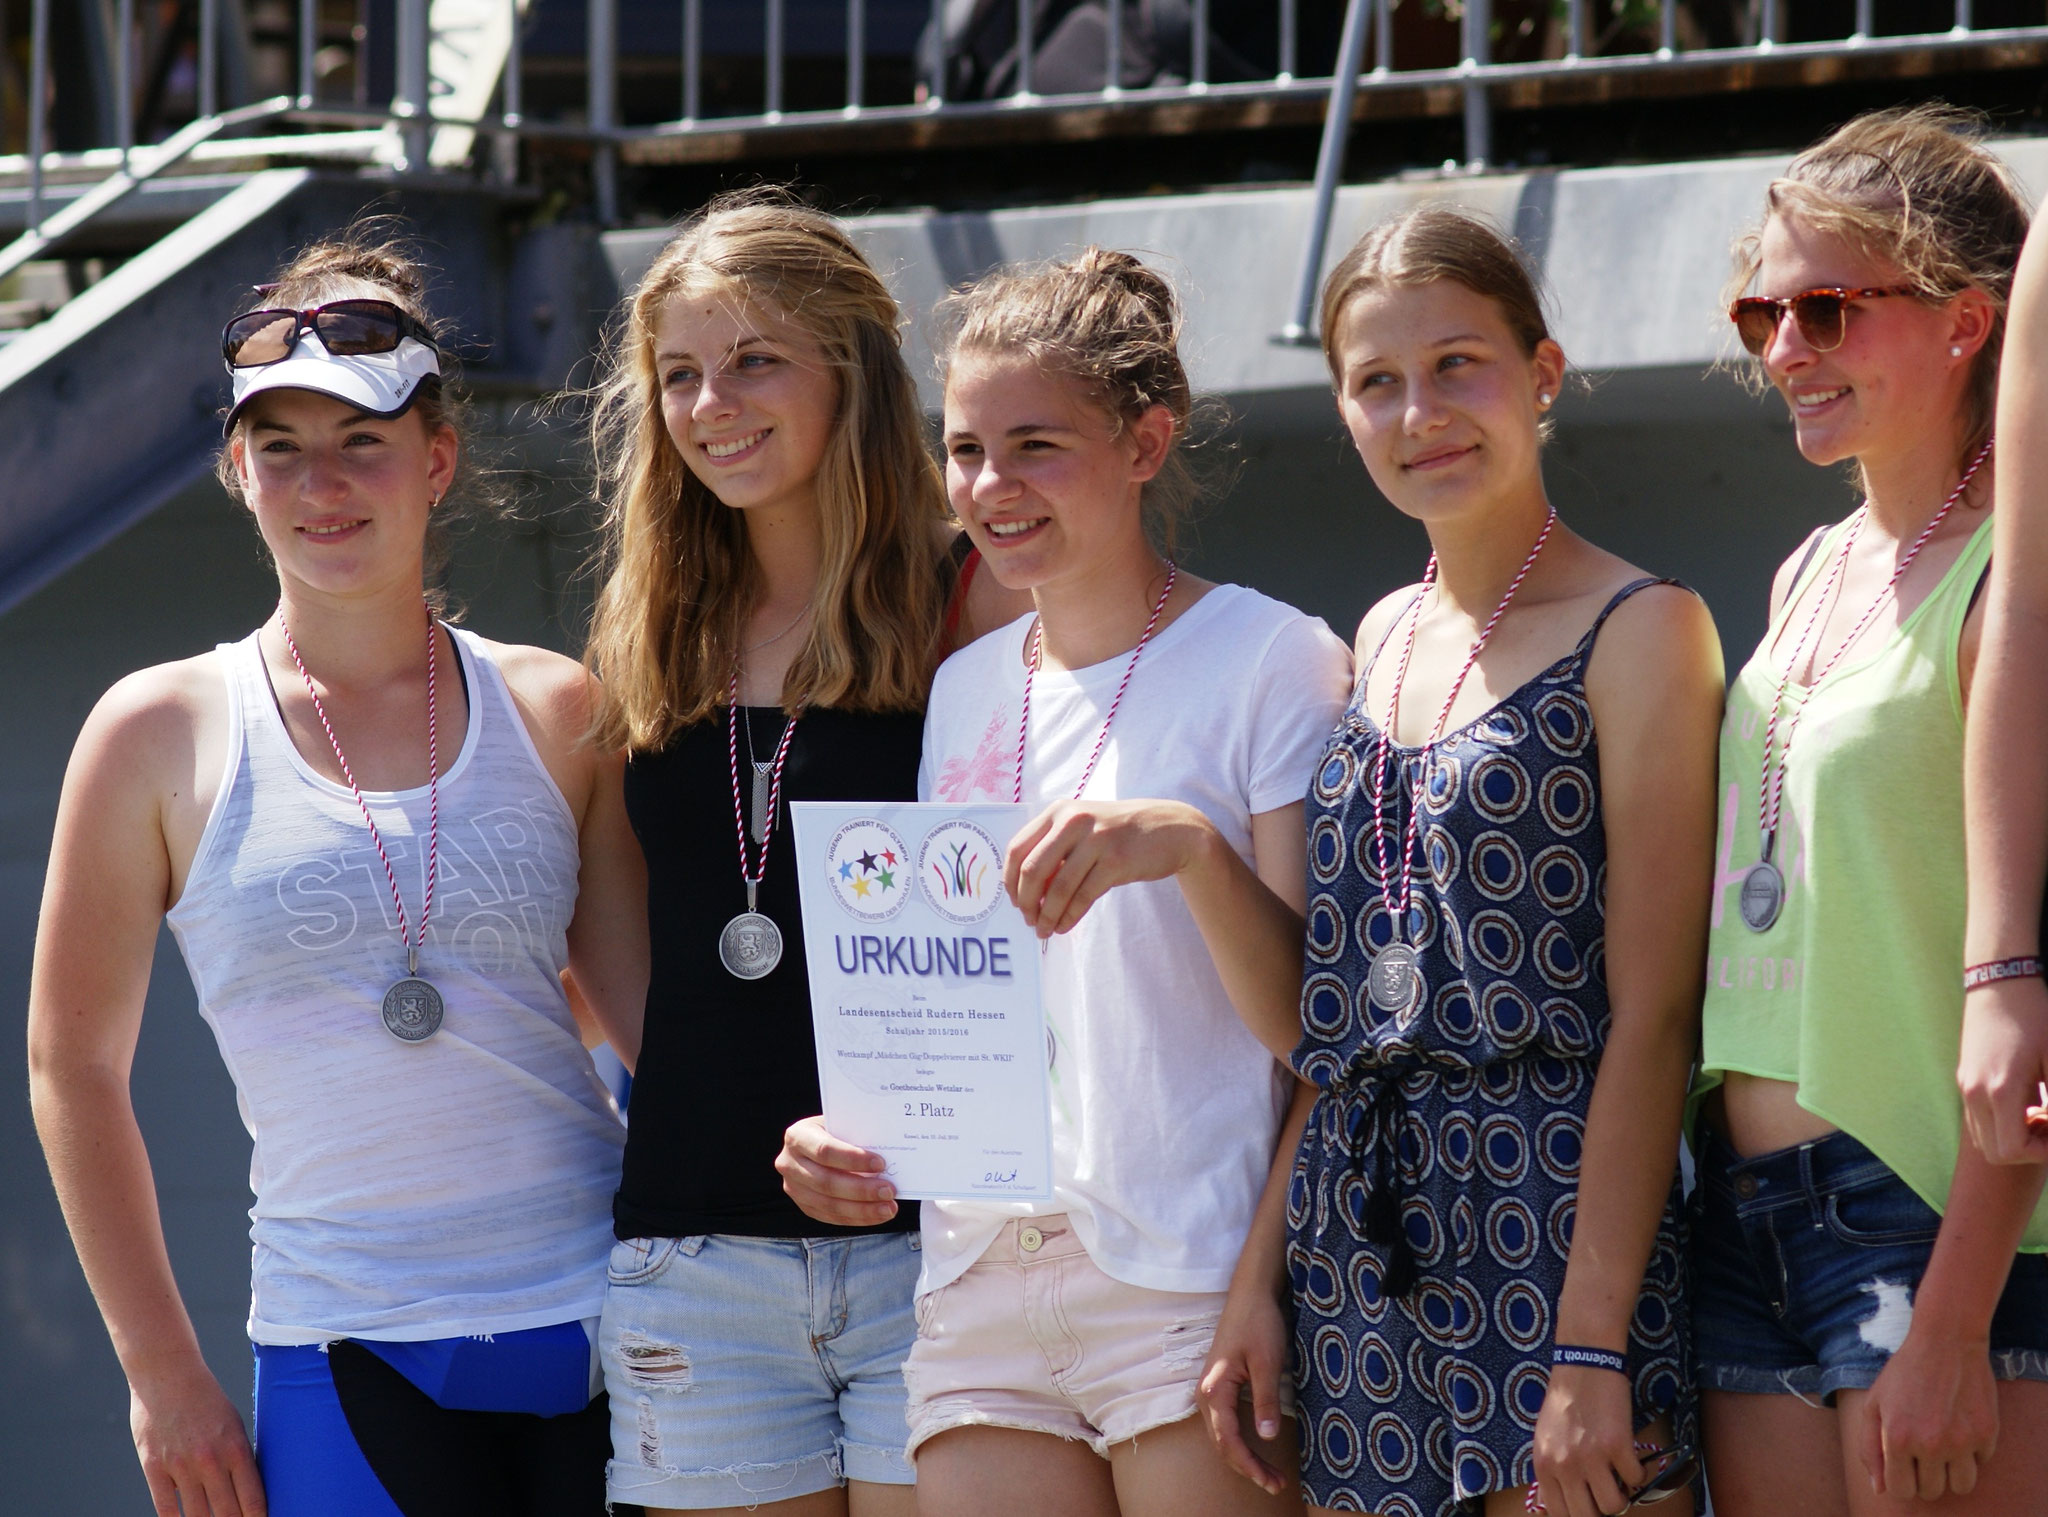 Silber Medaille für Sophia, Ann-Kathrin, Mara, Elisa, Sina